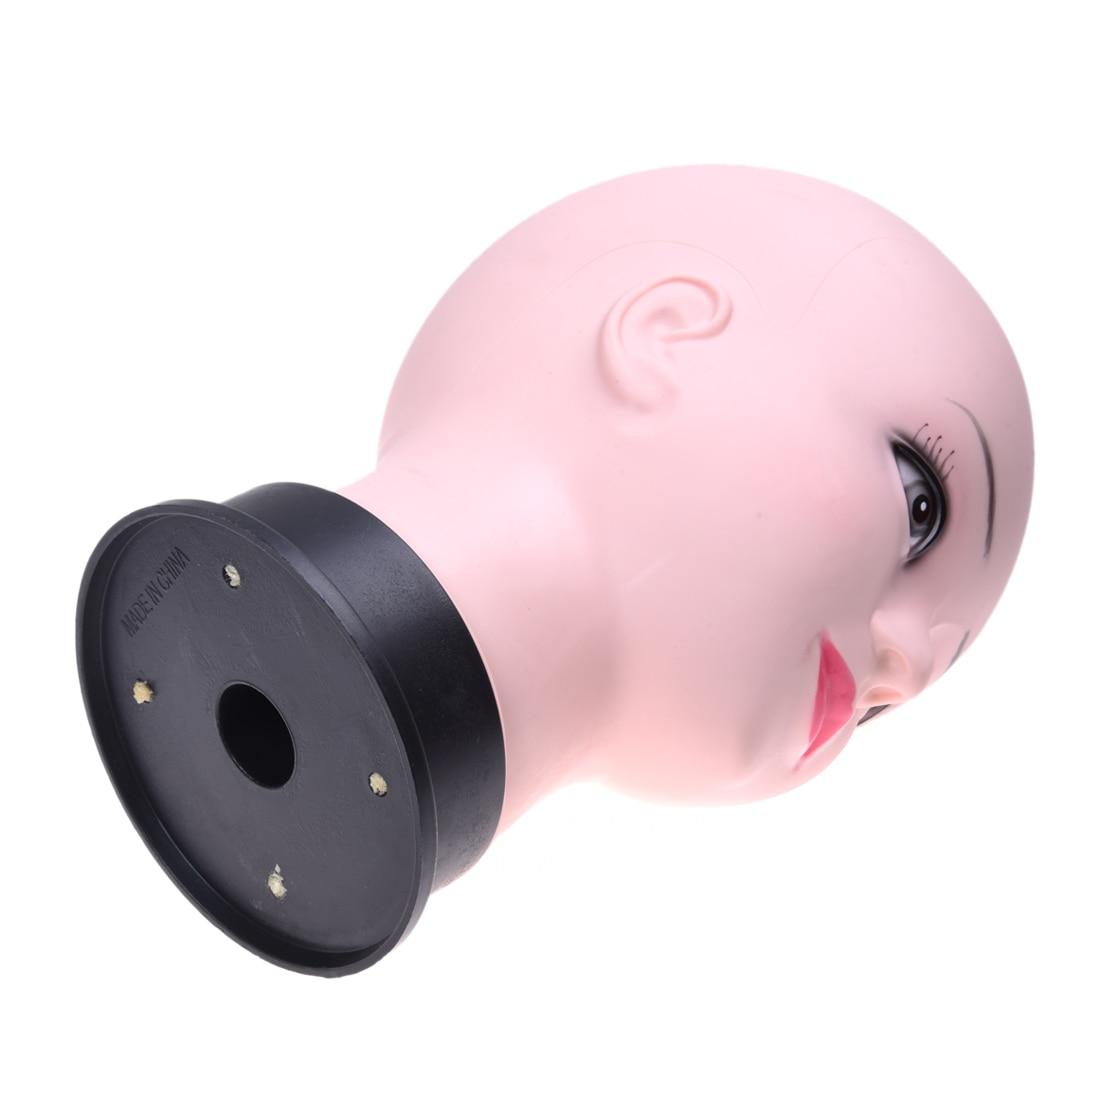 Cabeza de maniquí calva de cosmetología caliente